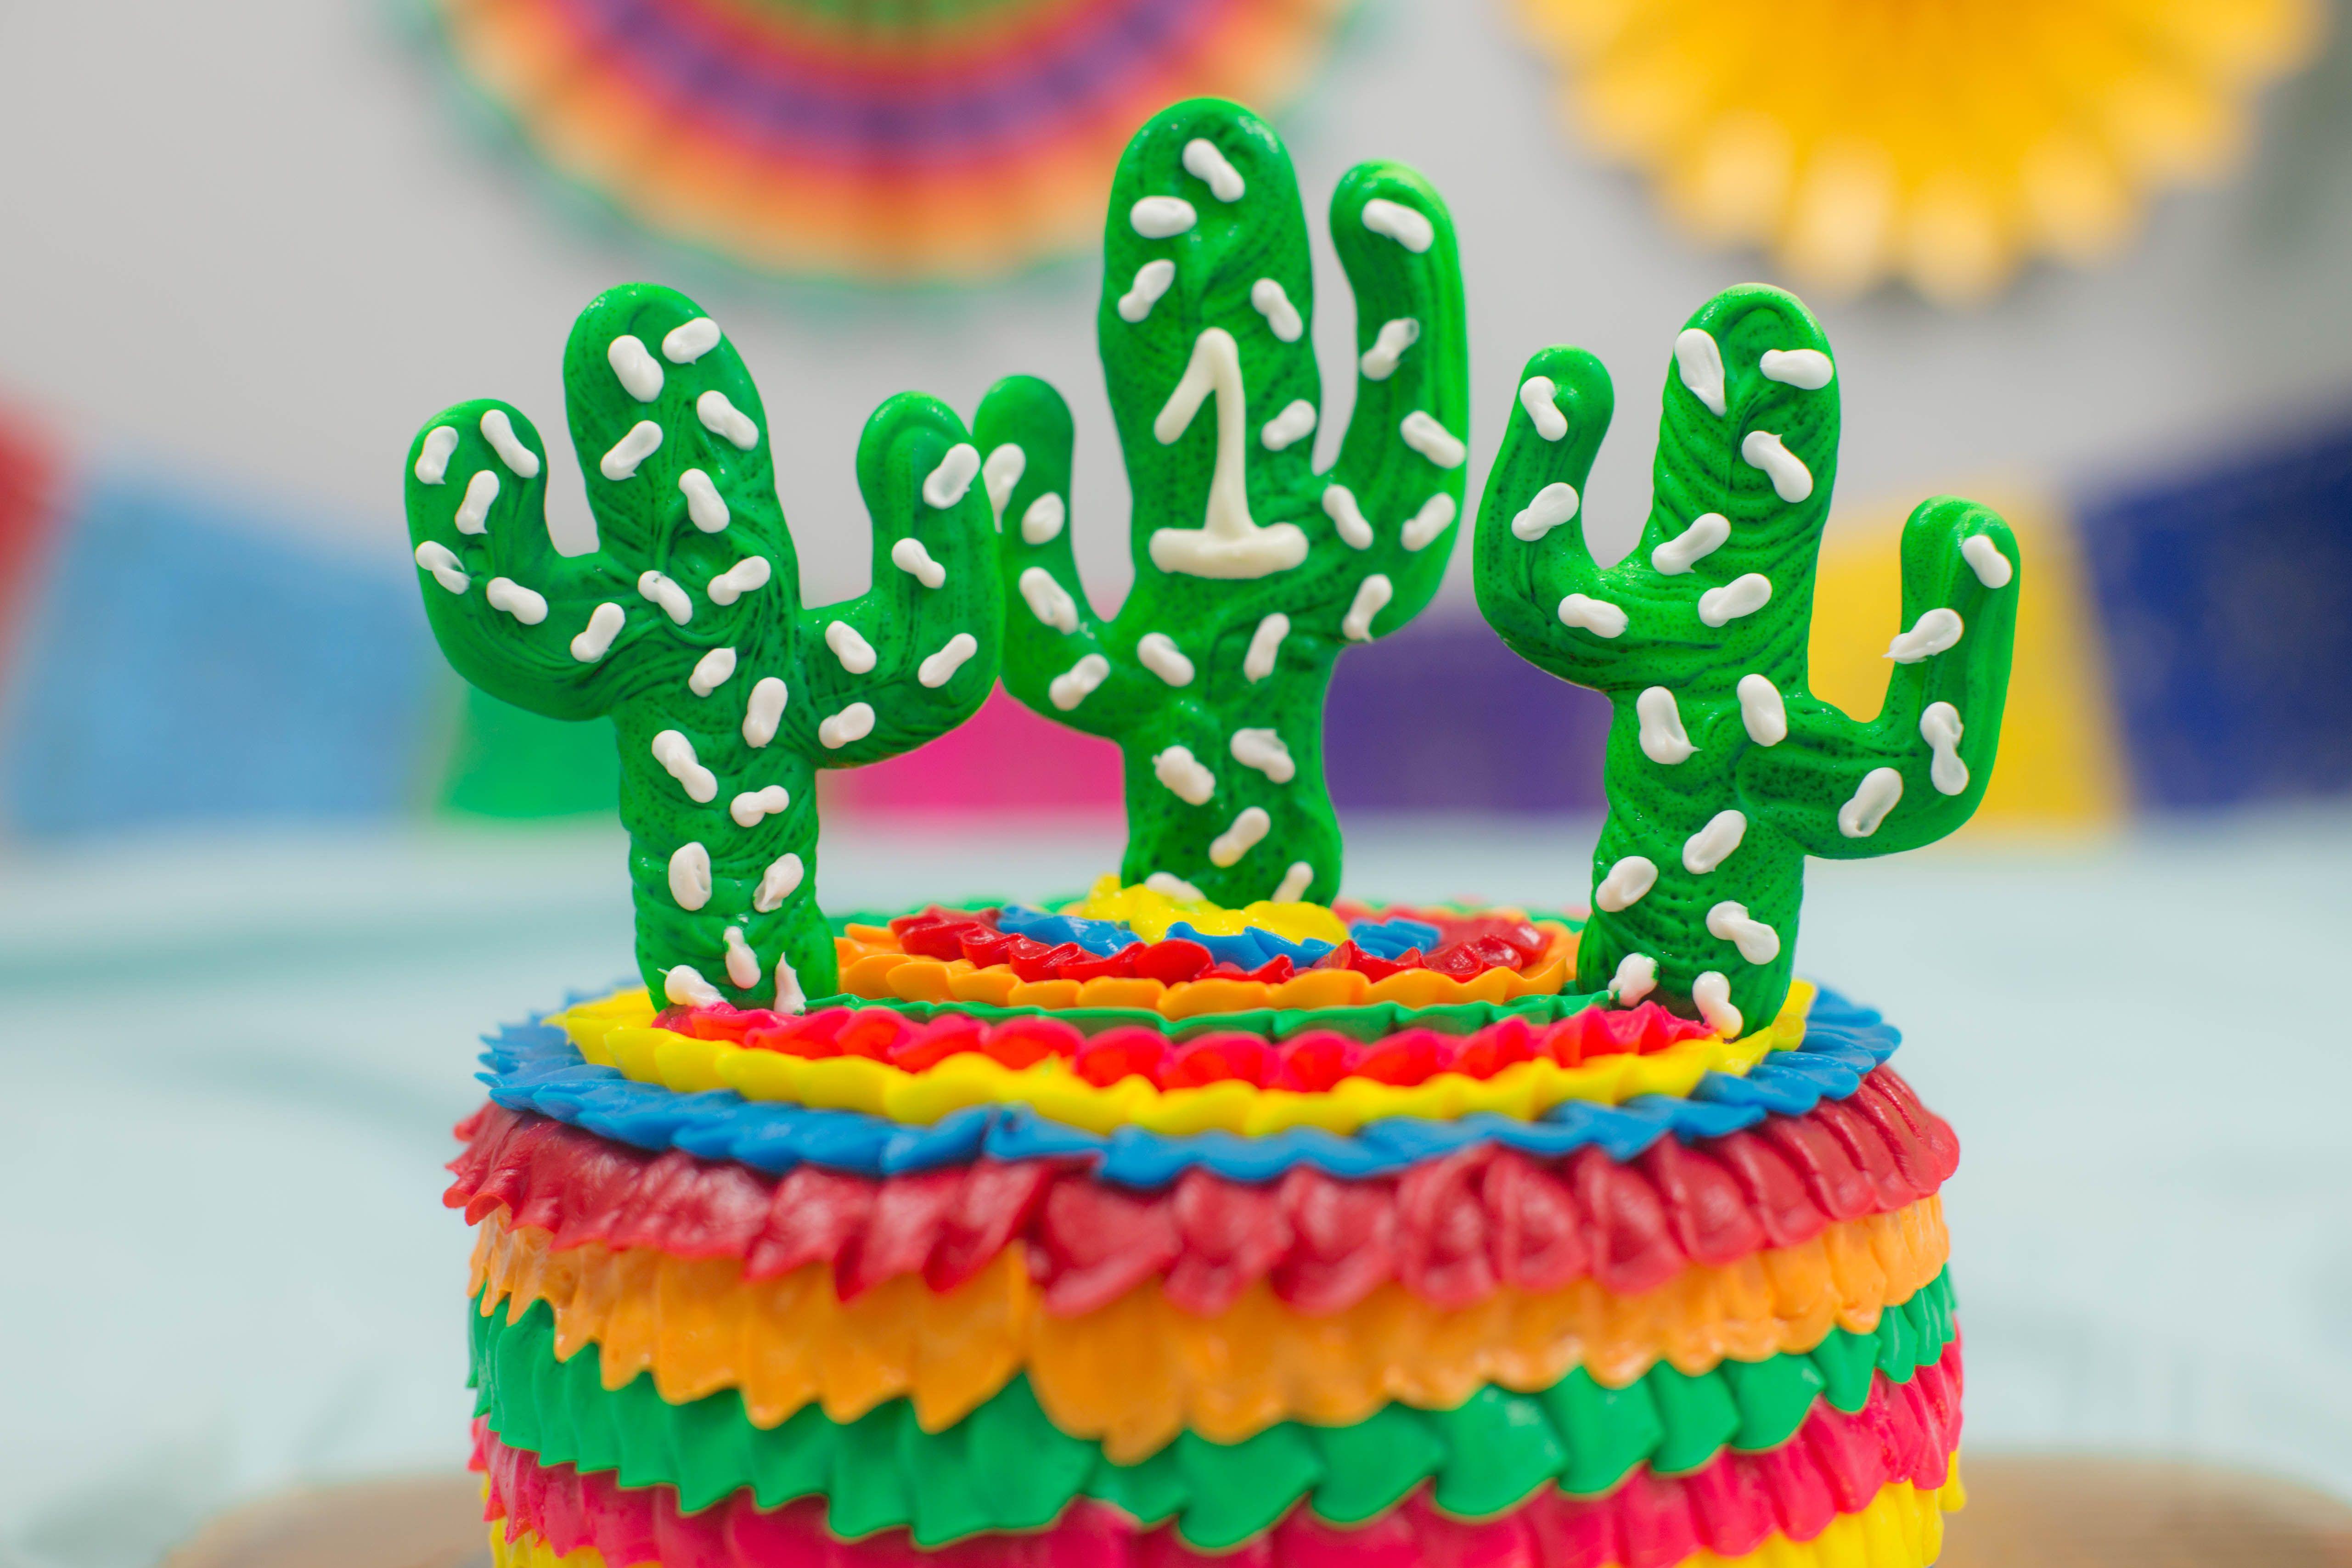 Cake smash chloe cummings photography in 2020 cake